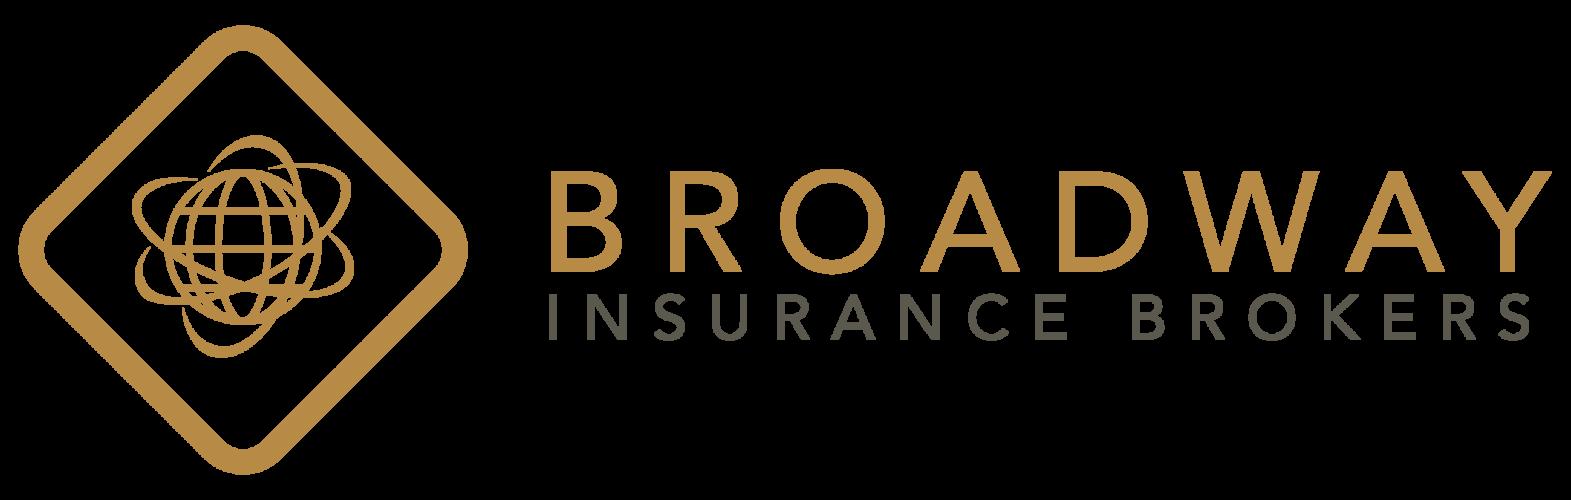 0582A Broadway Insurance Brokers Logo landscape gold grey e1596659501312 - Regulatory Information